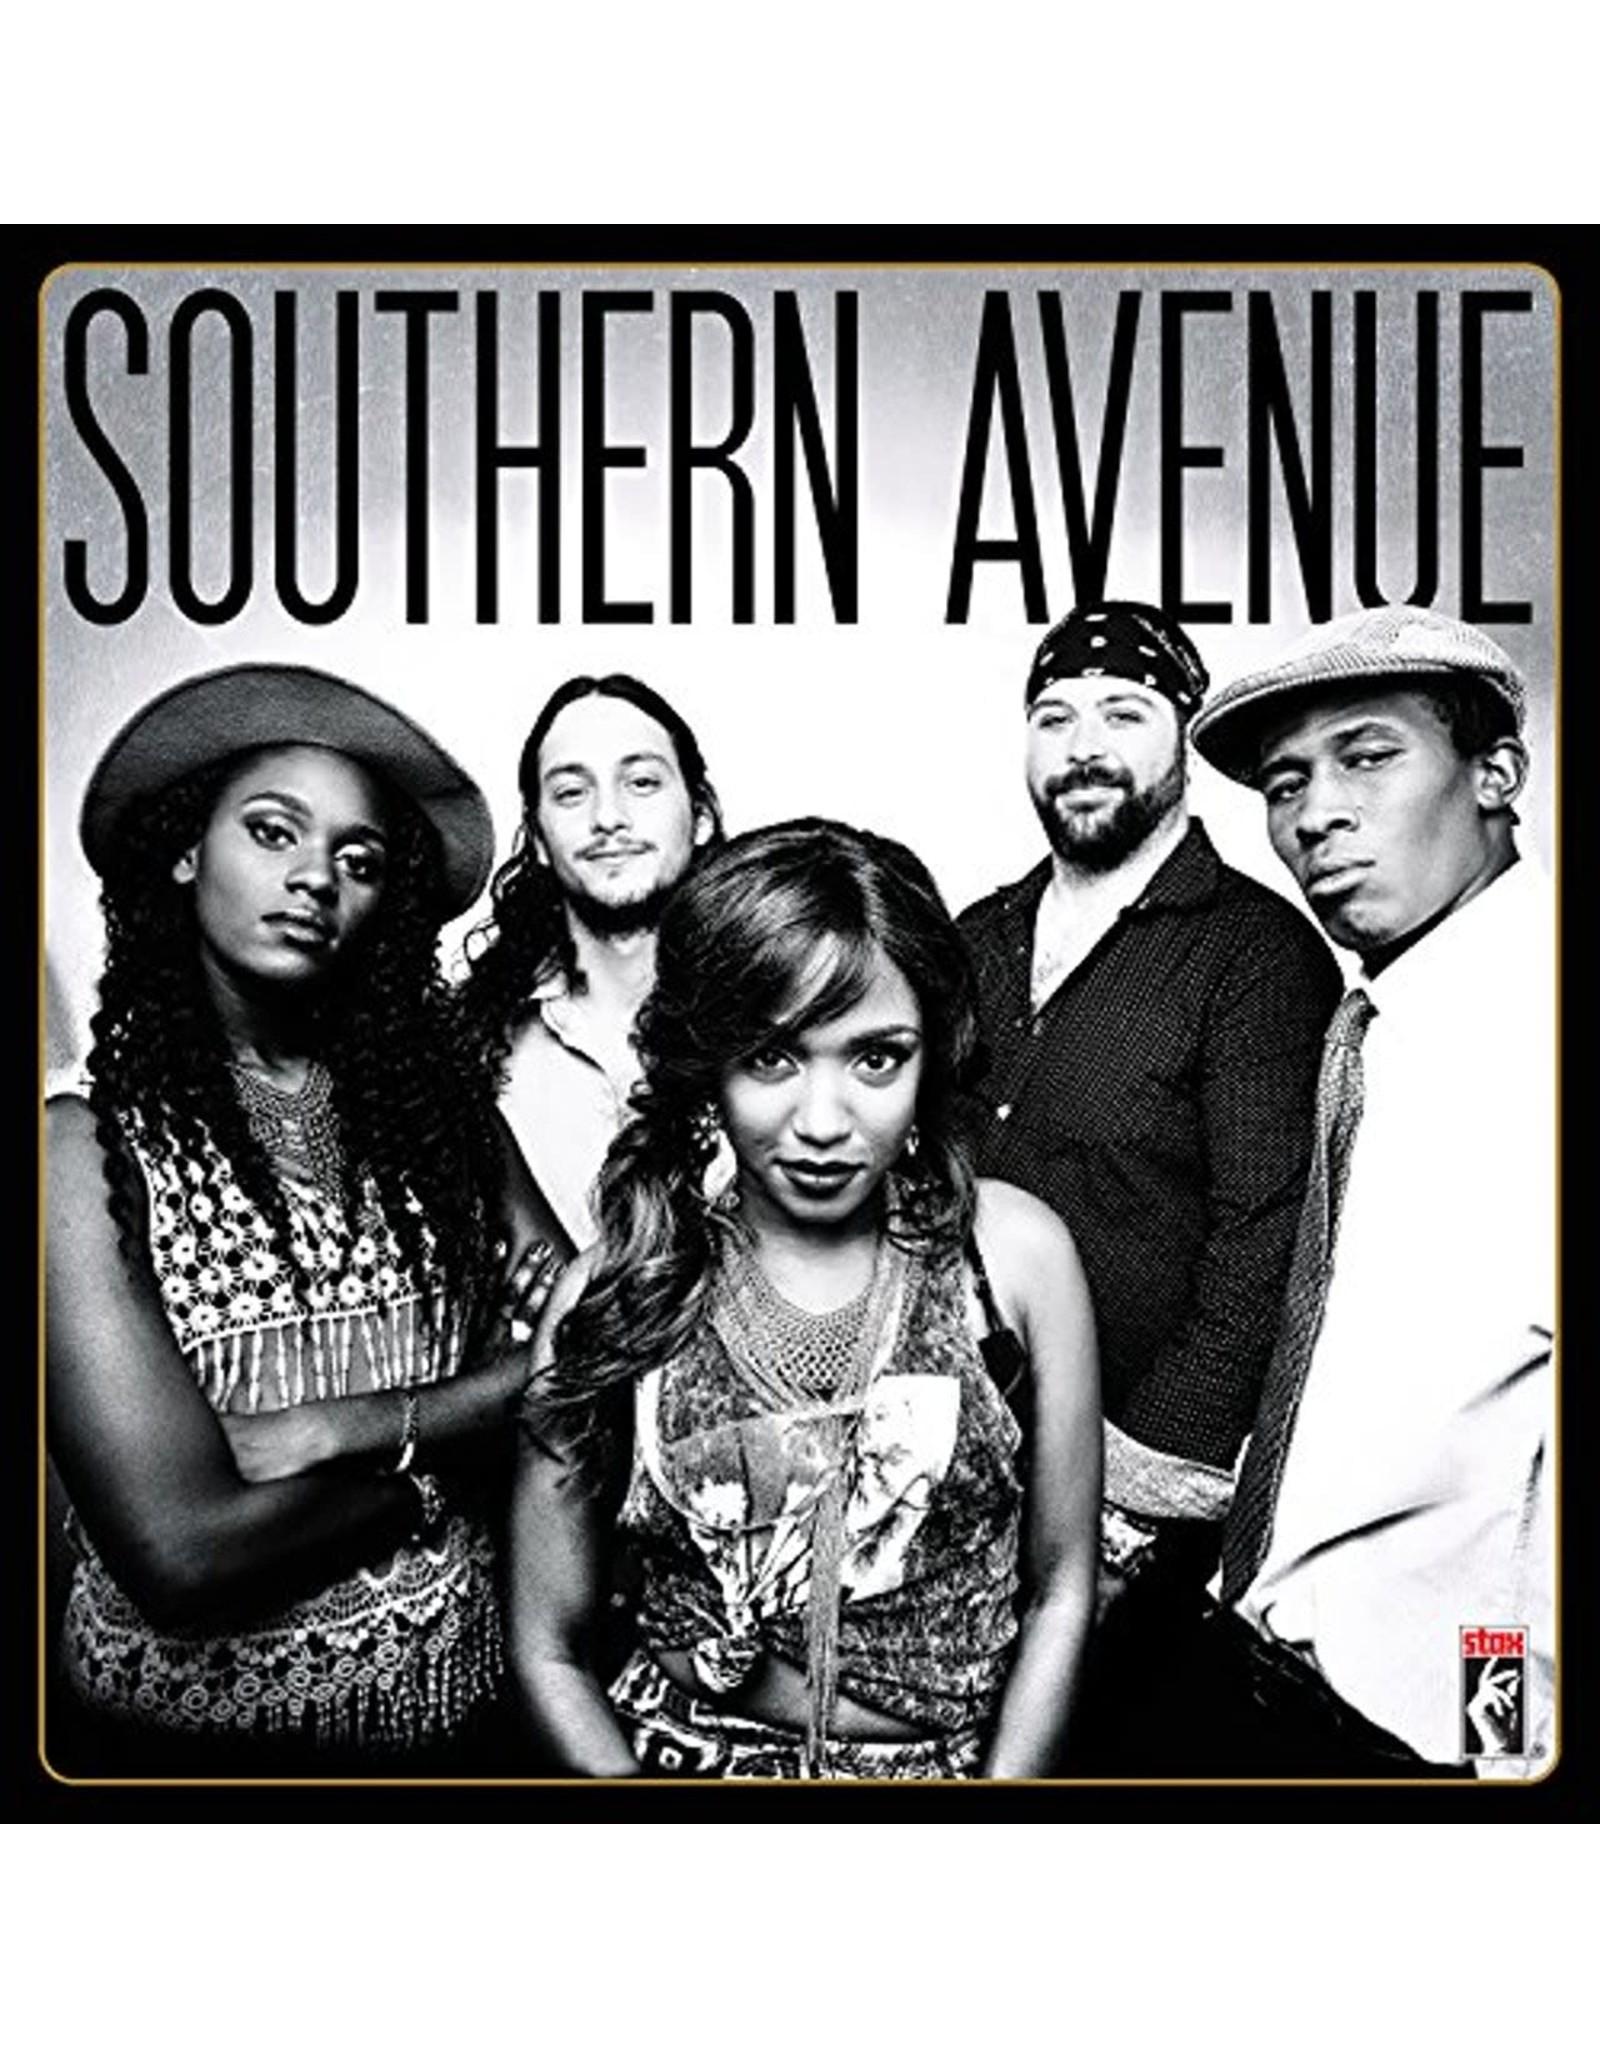 Southern Avenue - Southern Avenue CD